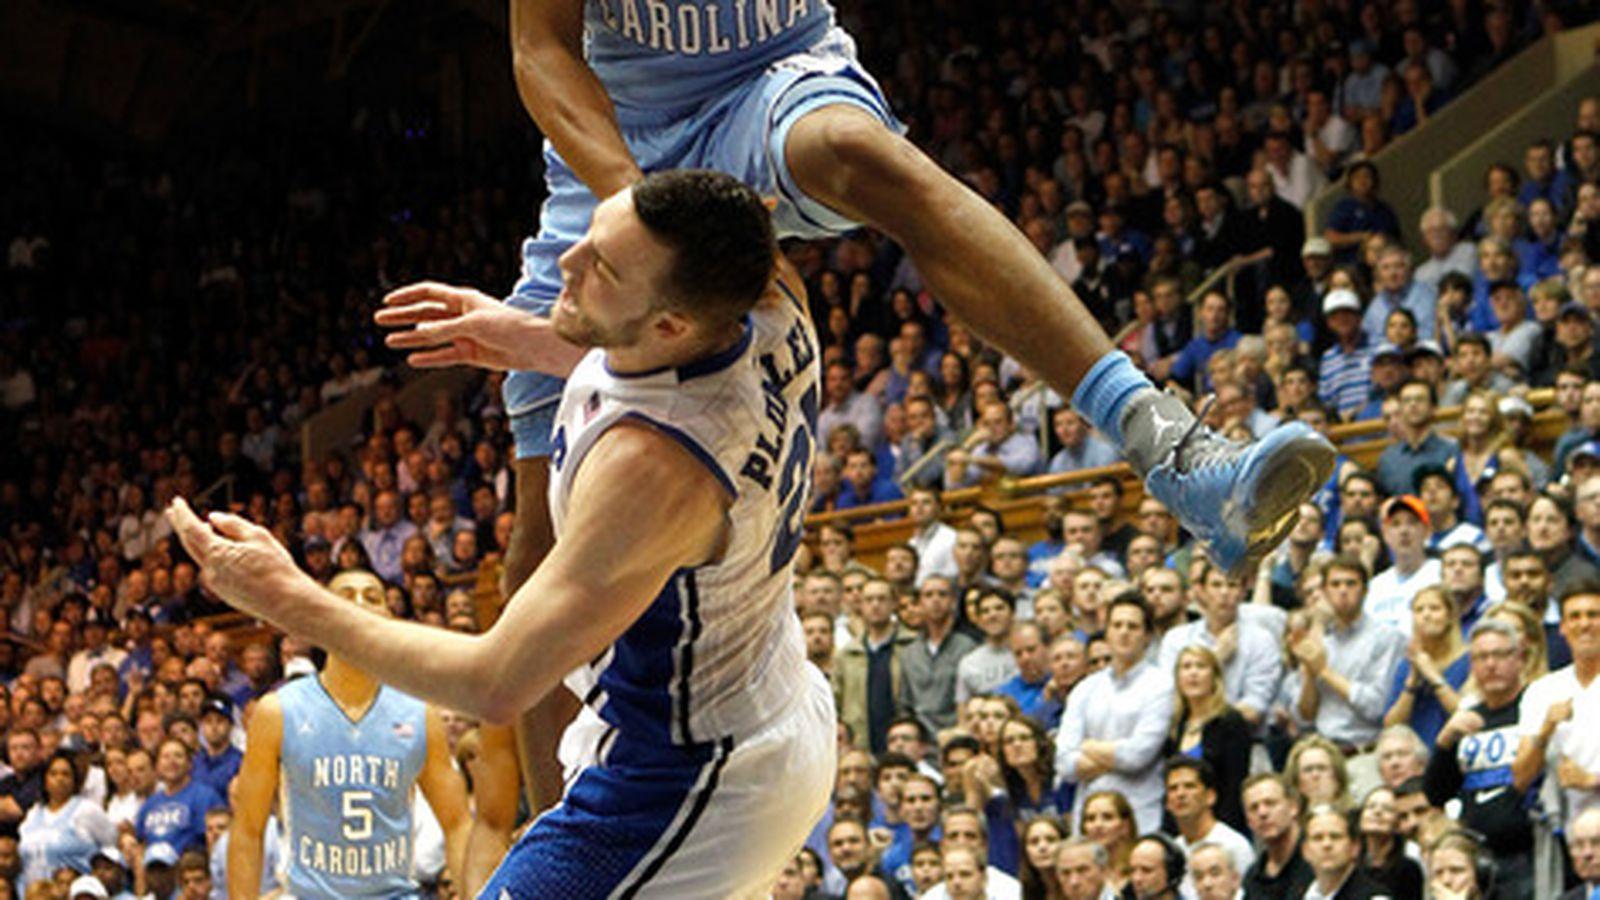 Unc Duke Score Live   All Basketball Scores Info